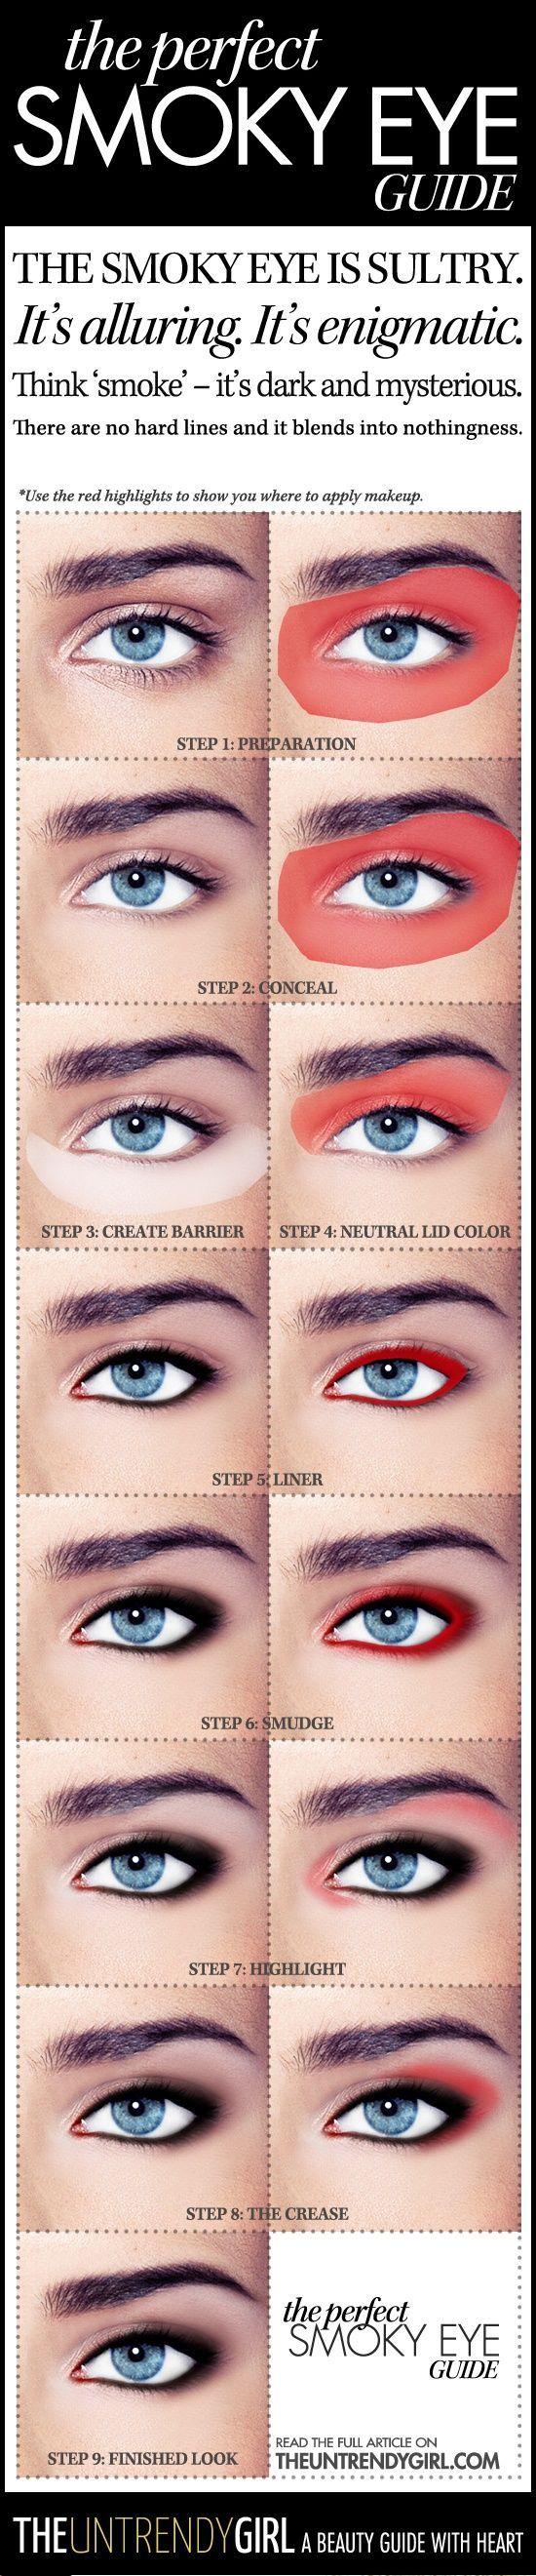 how to make the perfect smokey eye